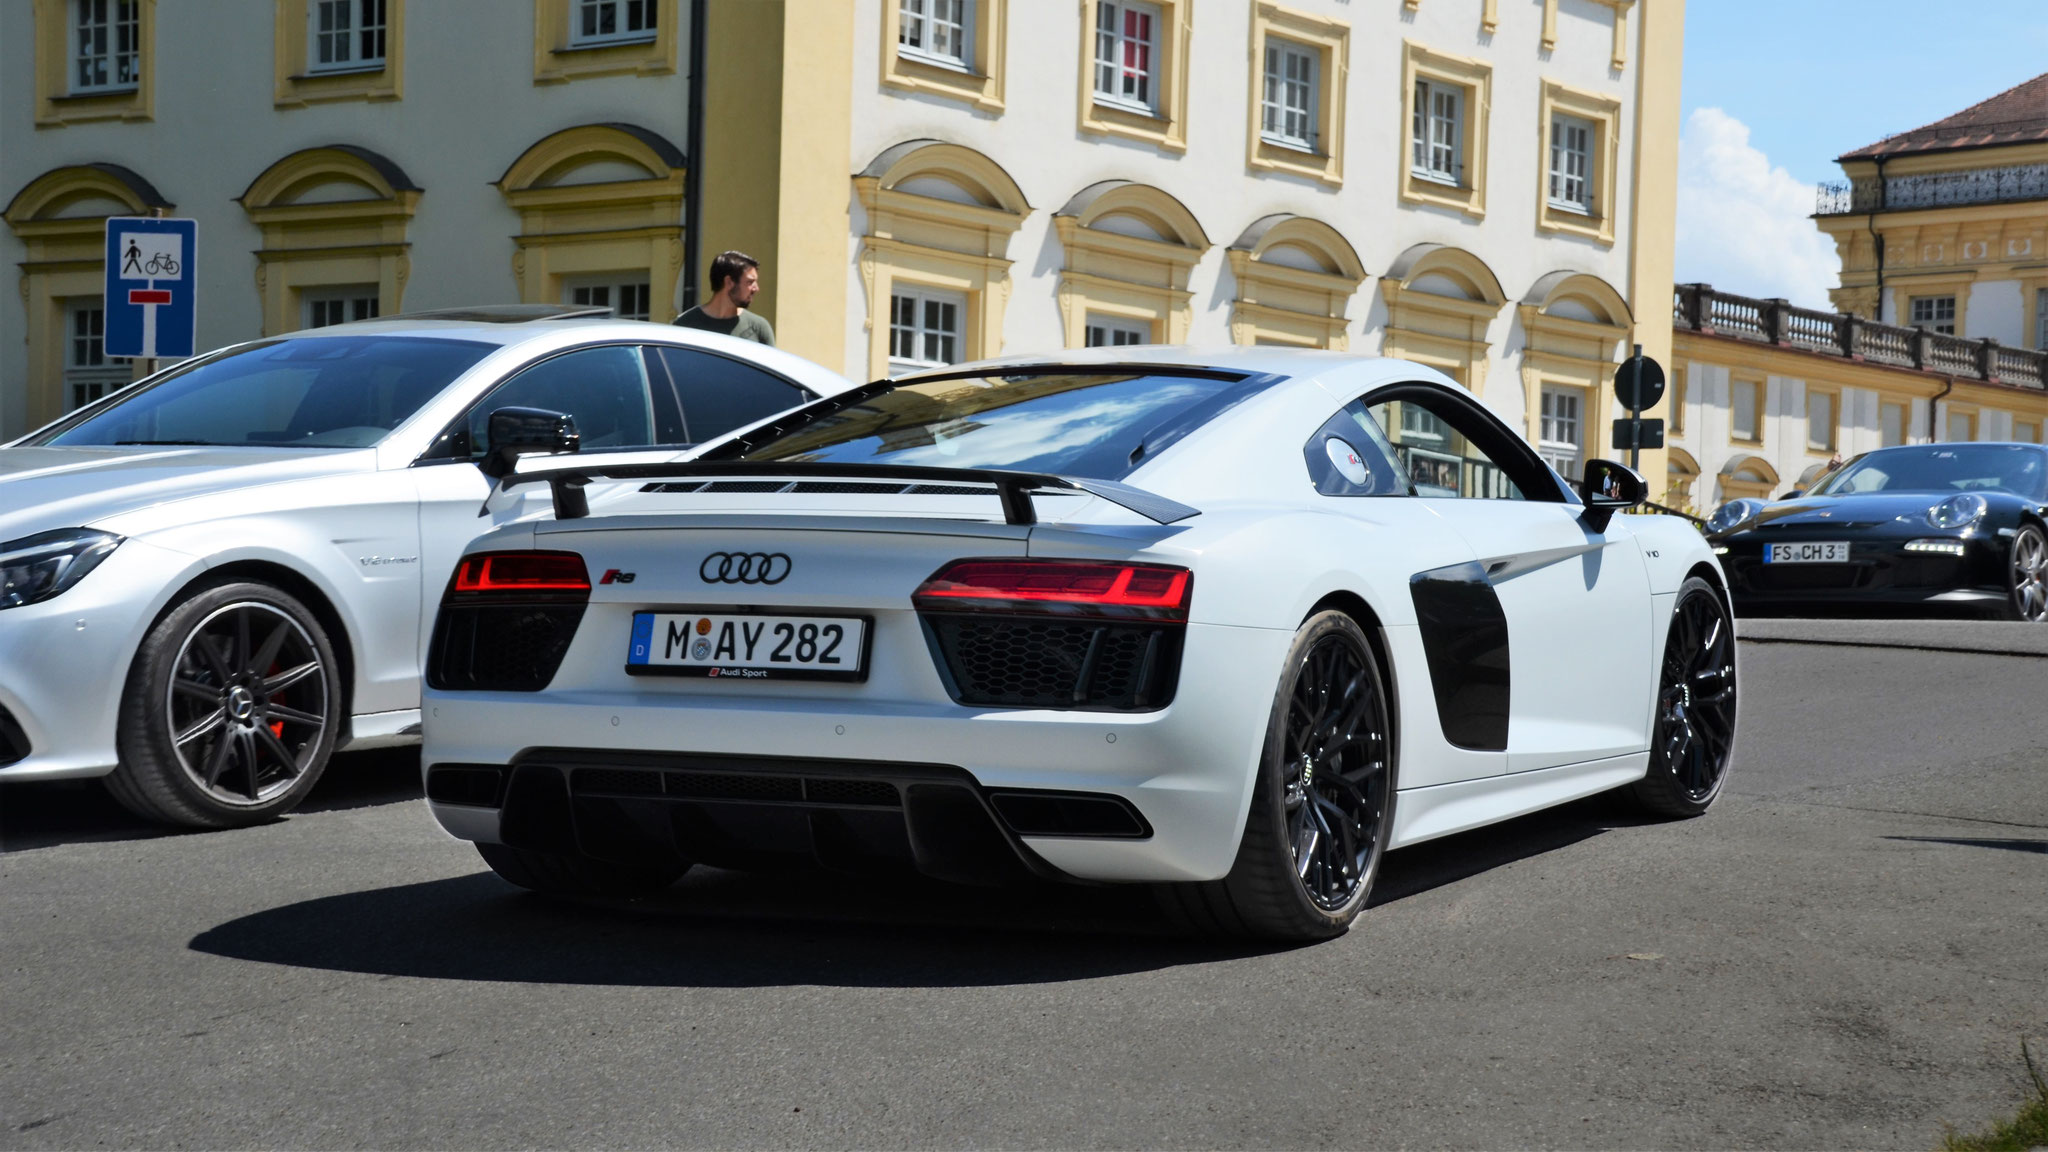 Audi R8 V10 - M-AY-282